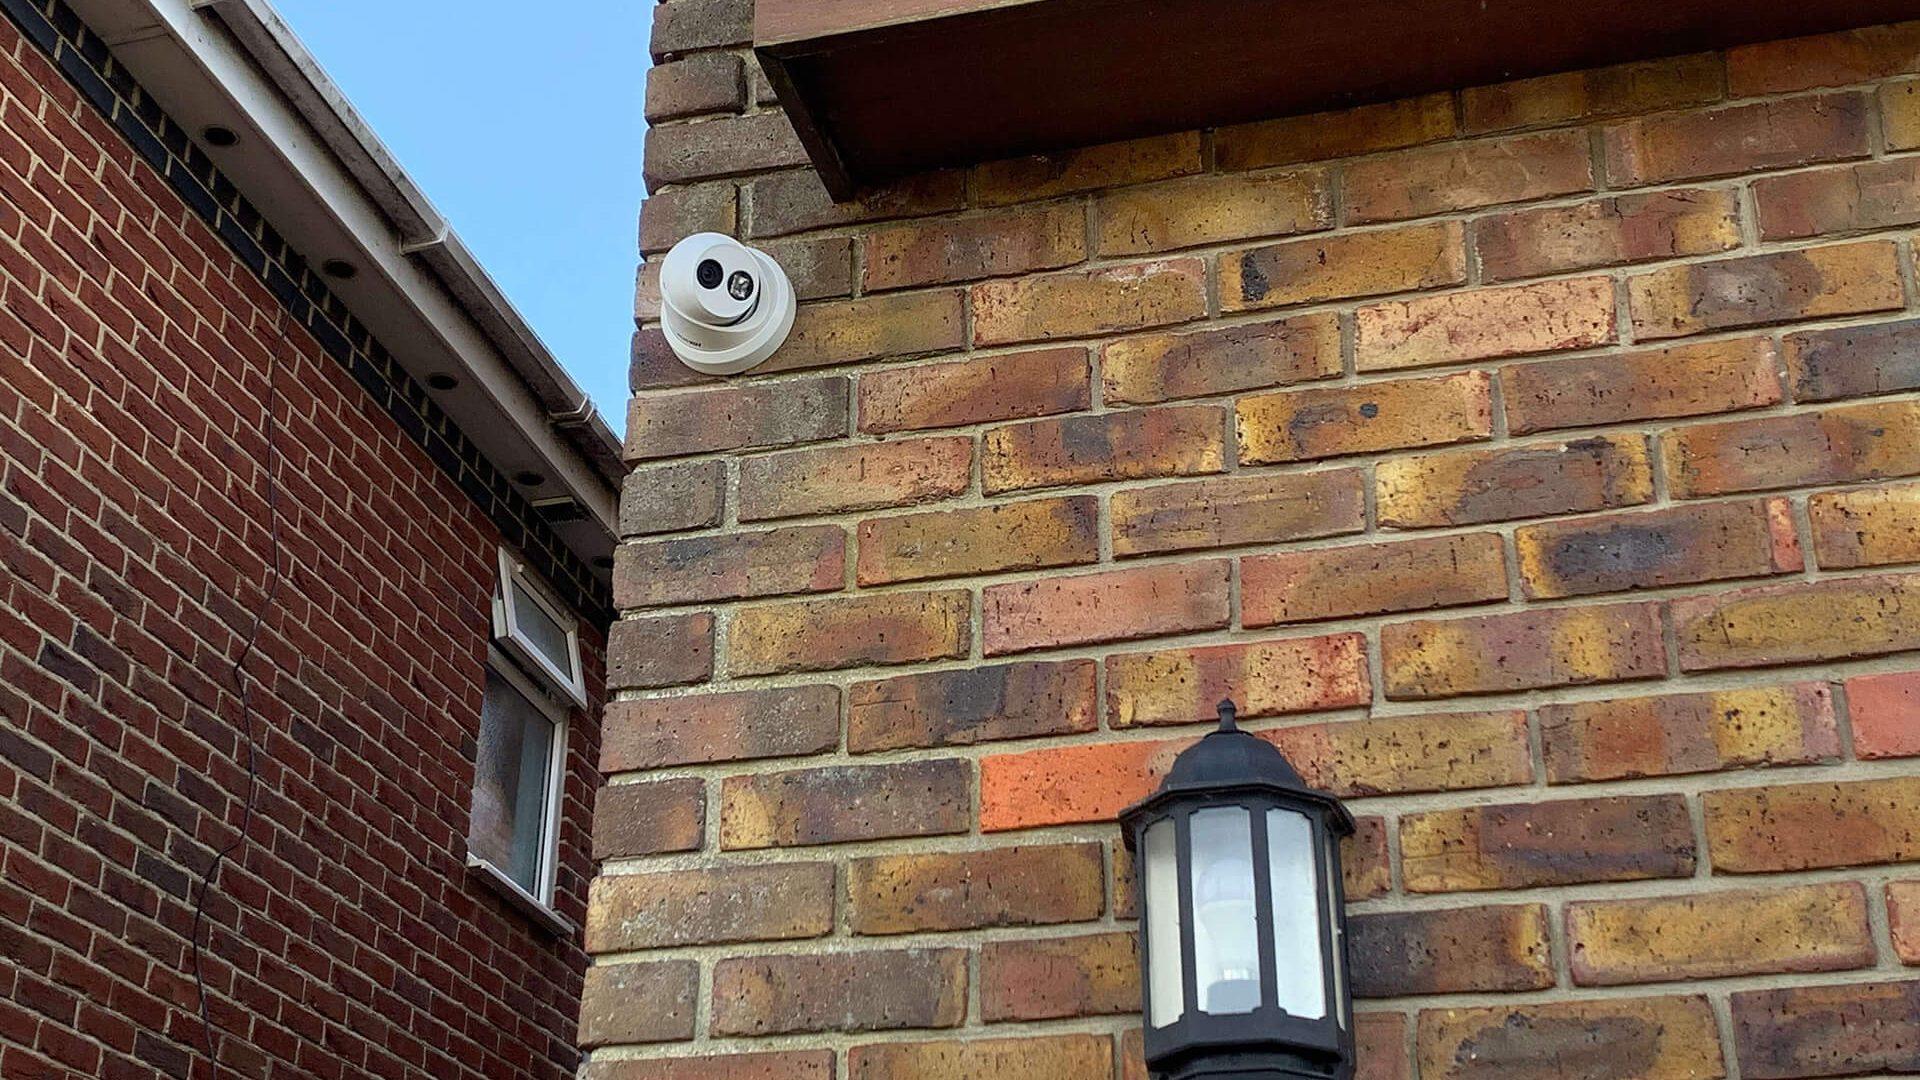 4K CCTV Installation in Canvey Island